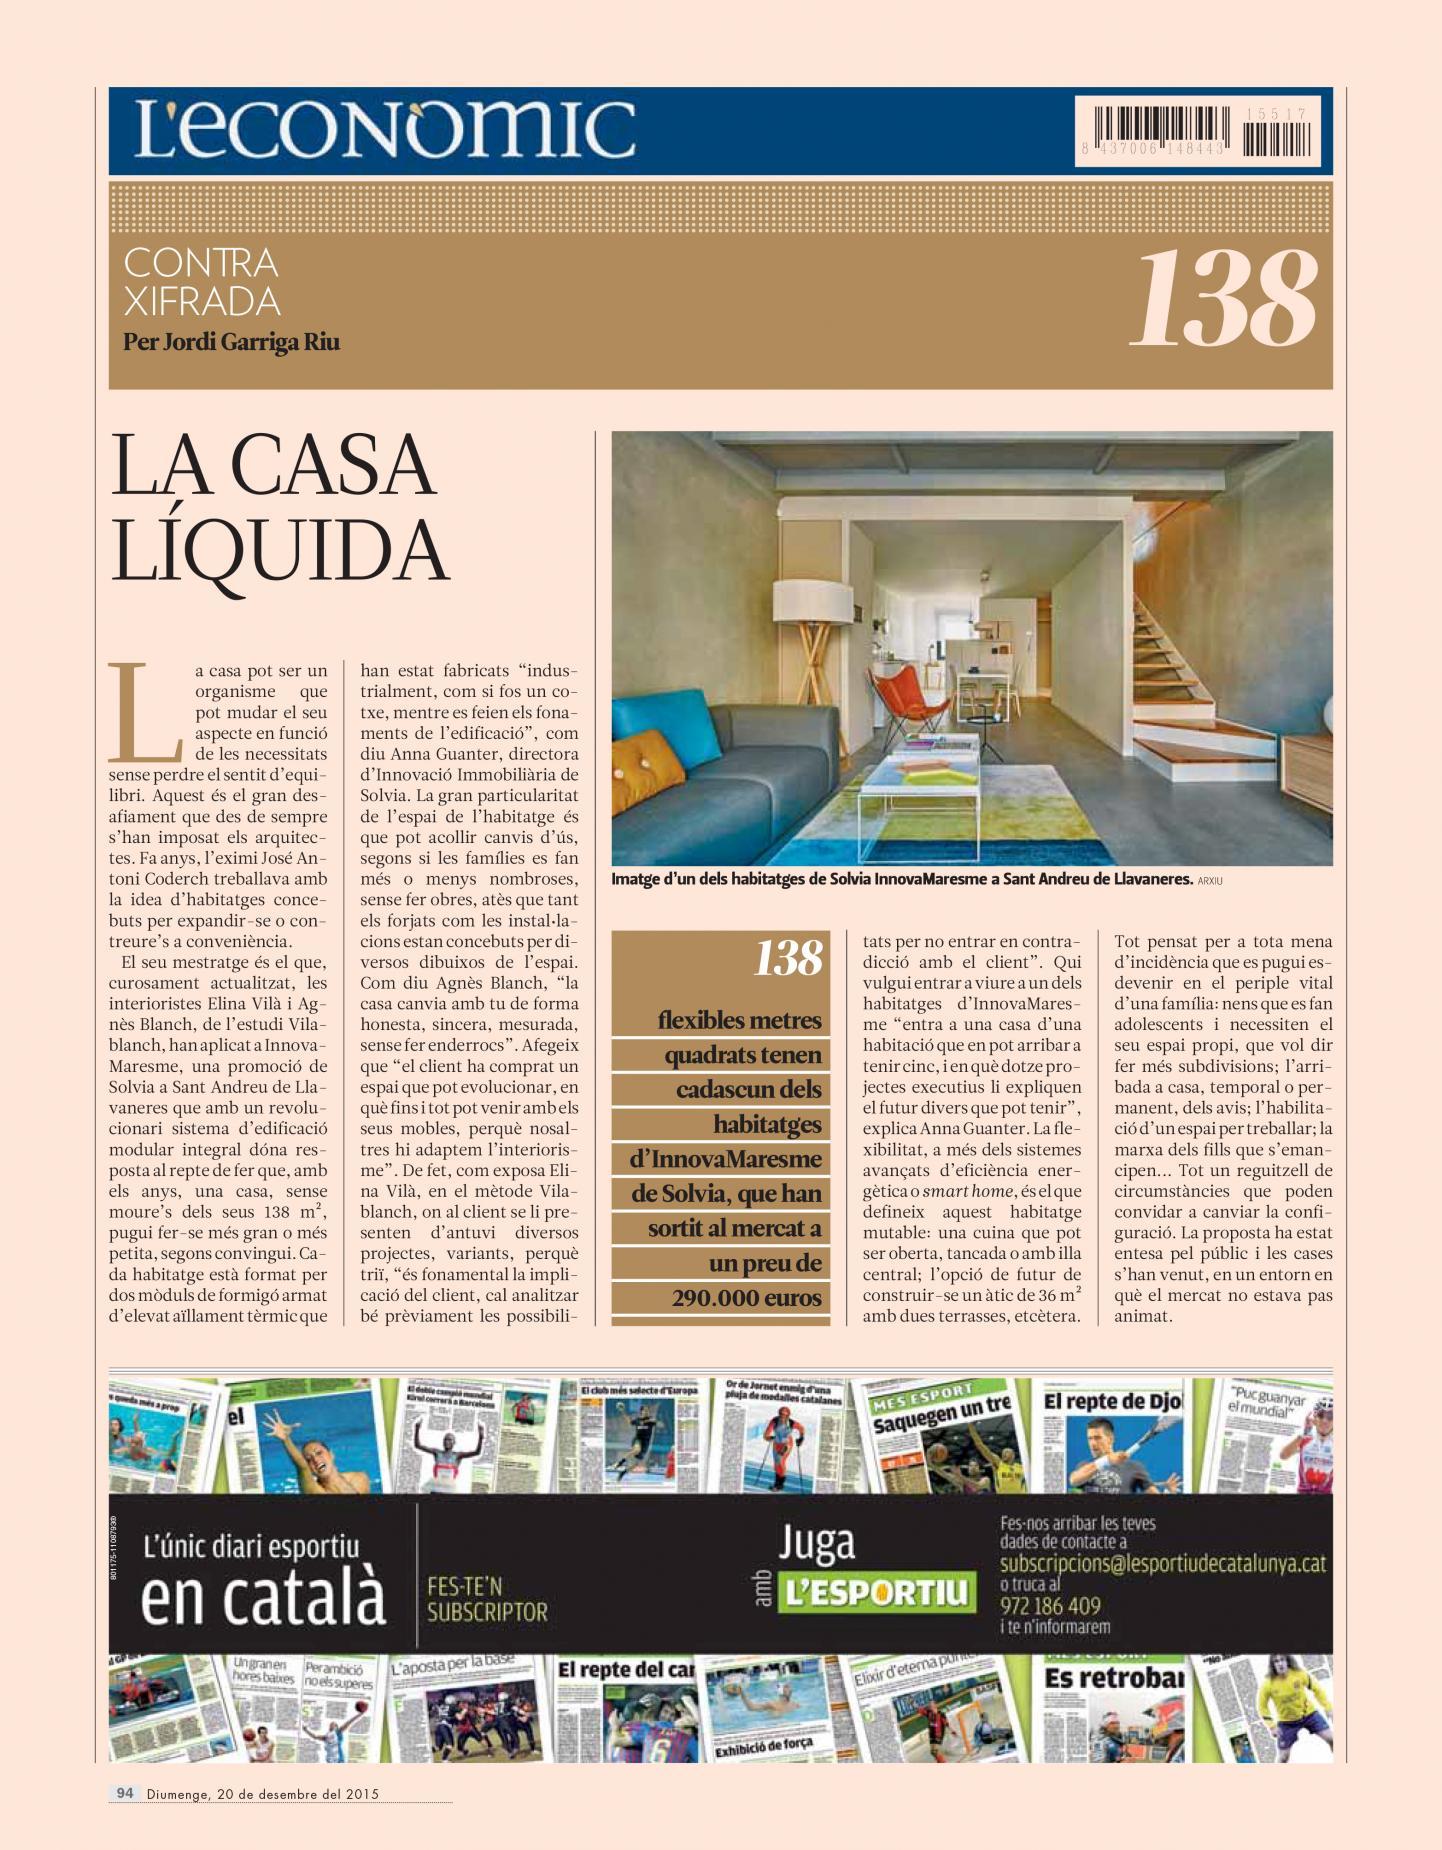 studio vilablanch interior design project Solvia Llavaneras El Punt Avui